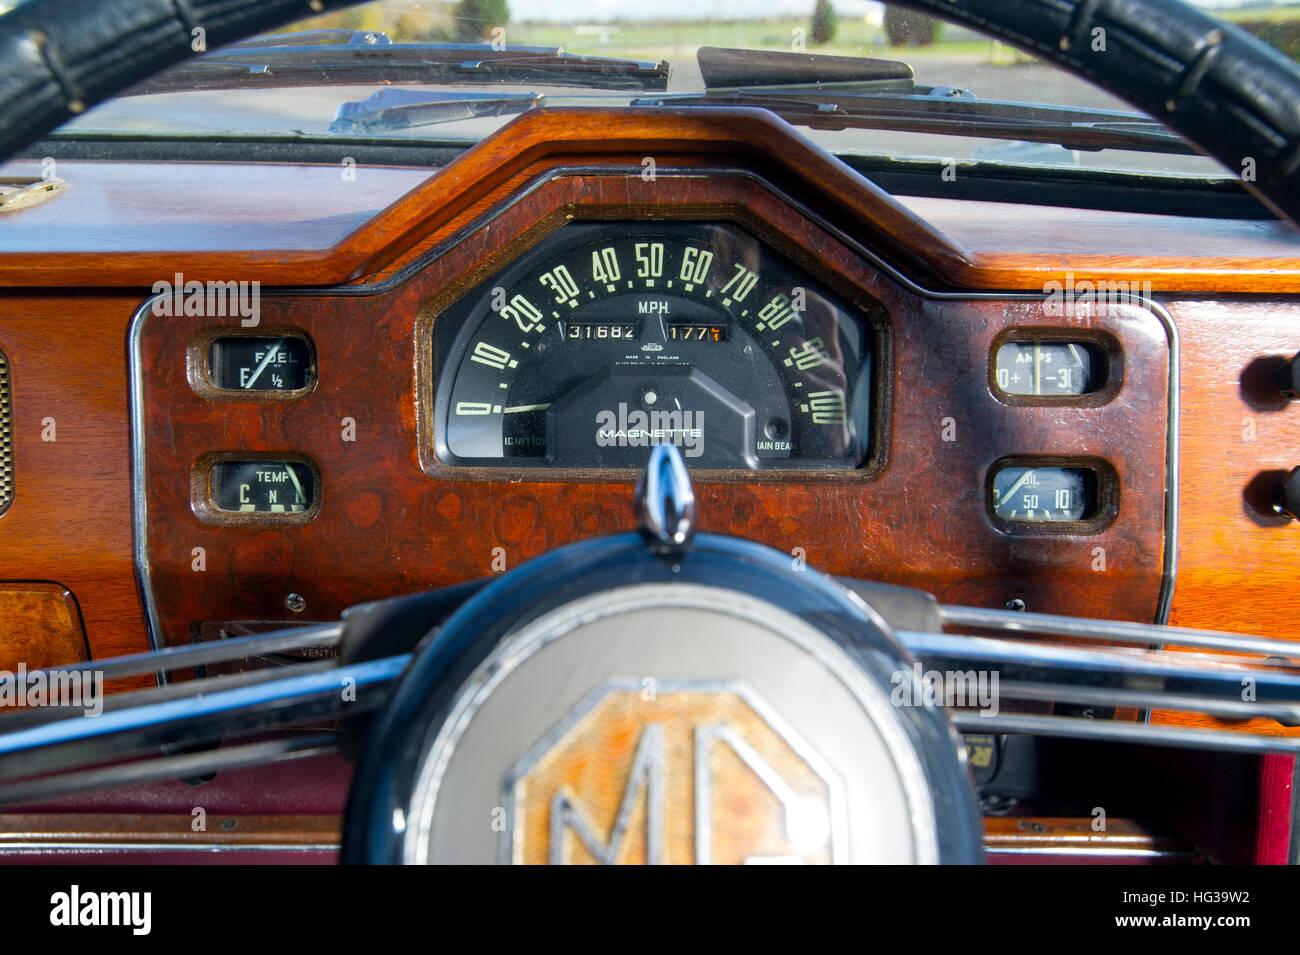 MG Magnette ZA classic British sports saloon car speedometer in art deco dashboard Stock Photo